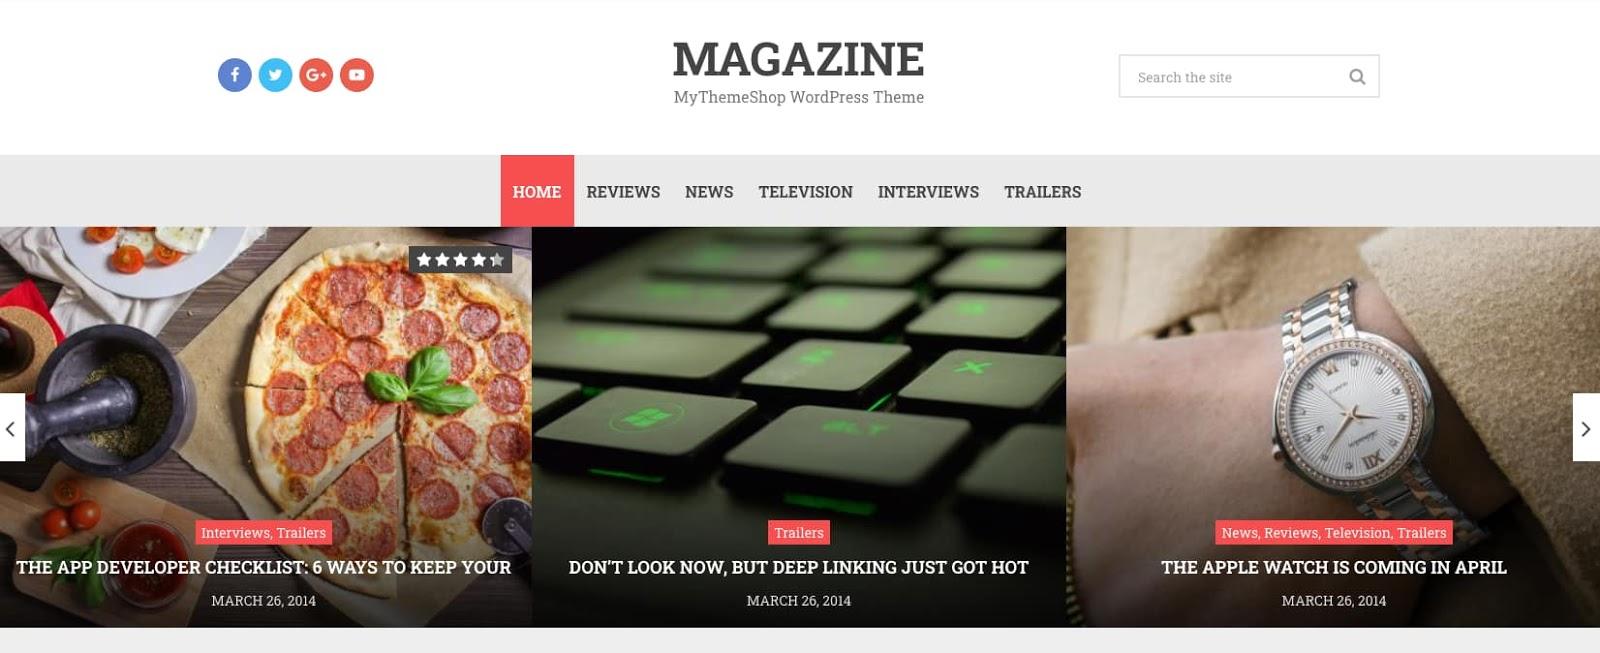 demo of the wordpress theme for adsense magazine